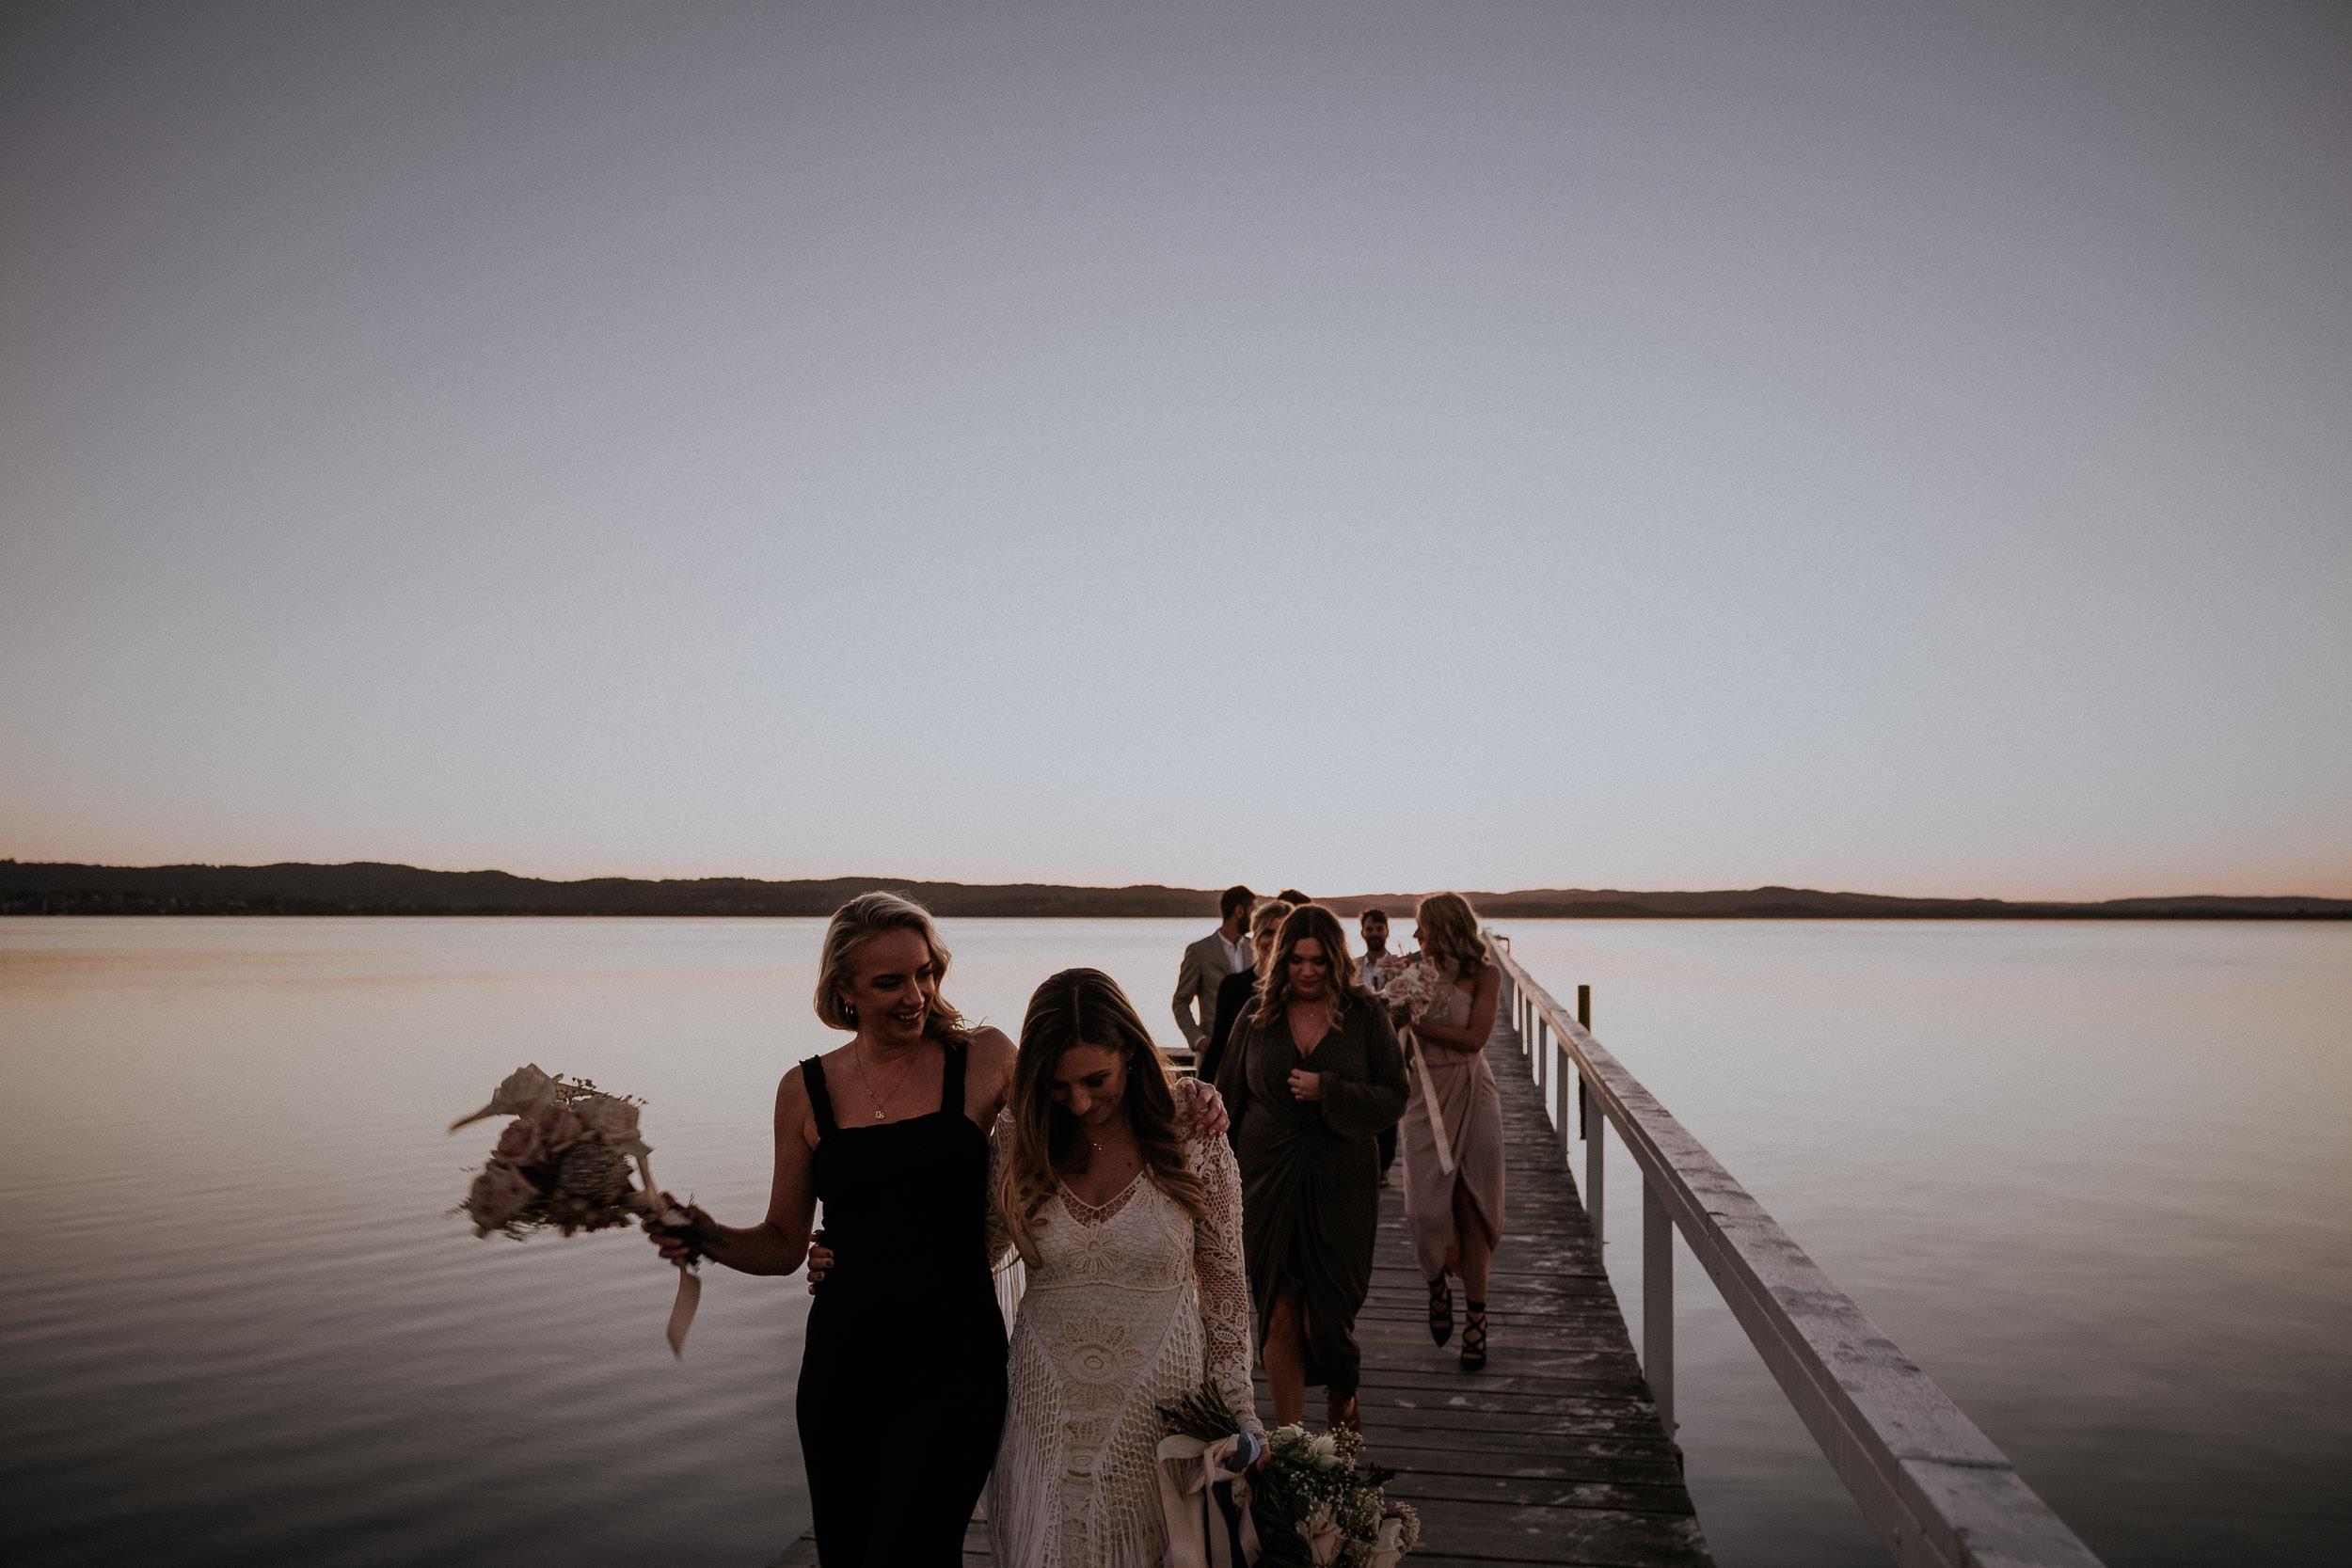 S&A Elopement - Kings & Thieves - Shred 'Til Dead - Central Coast Beach Forest Wedding - 408.jpg